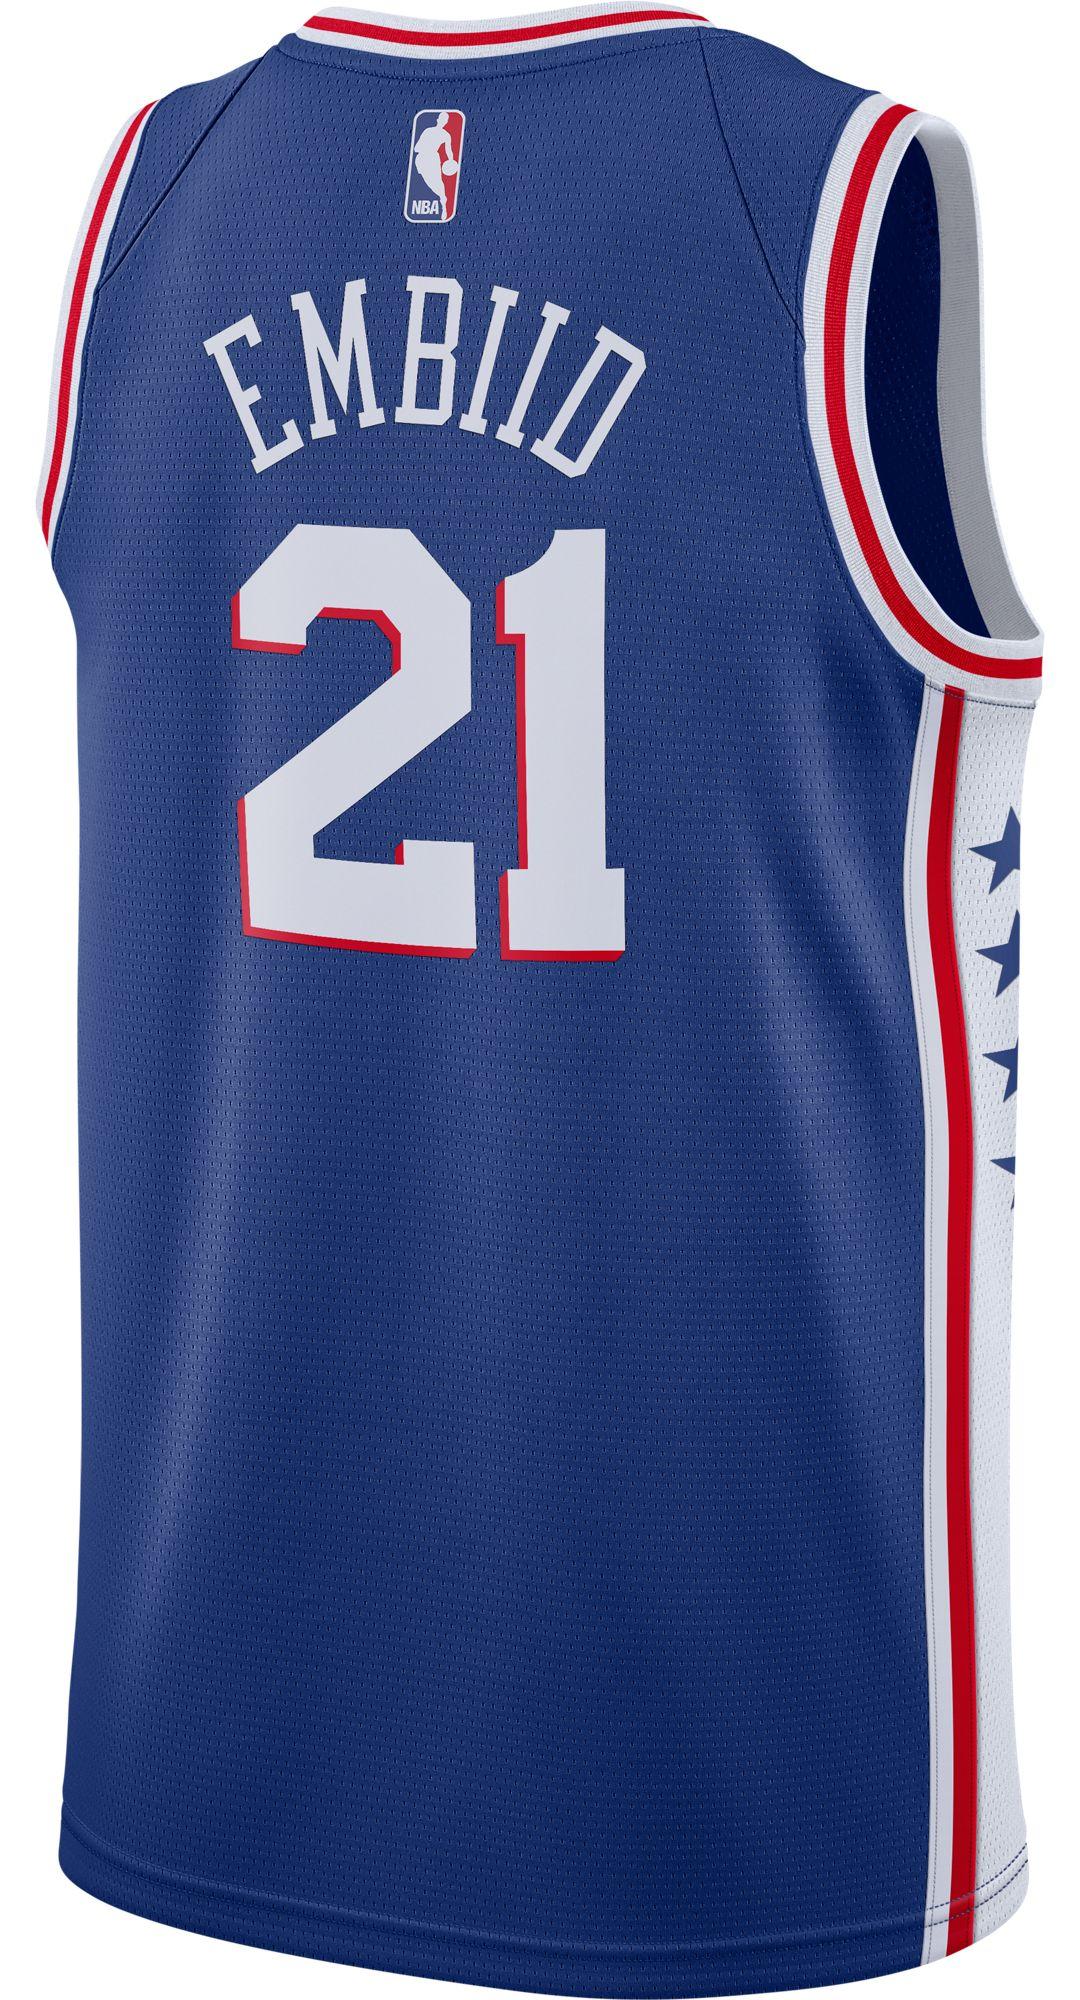 meet fa37b a4a7d Nike Men's Philadelphia 76ers Joel Embiid #21 Royal Dri-FIT Swingman Jersey